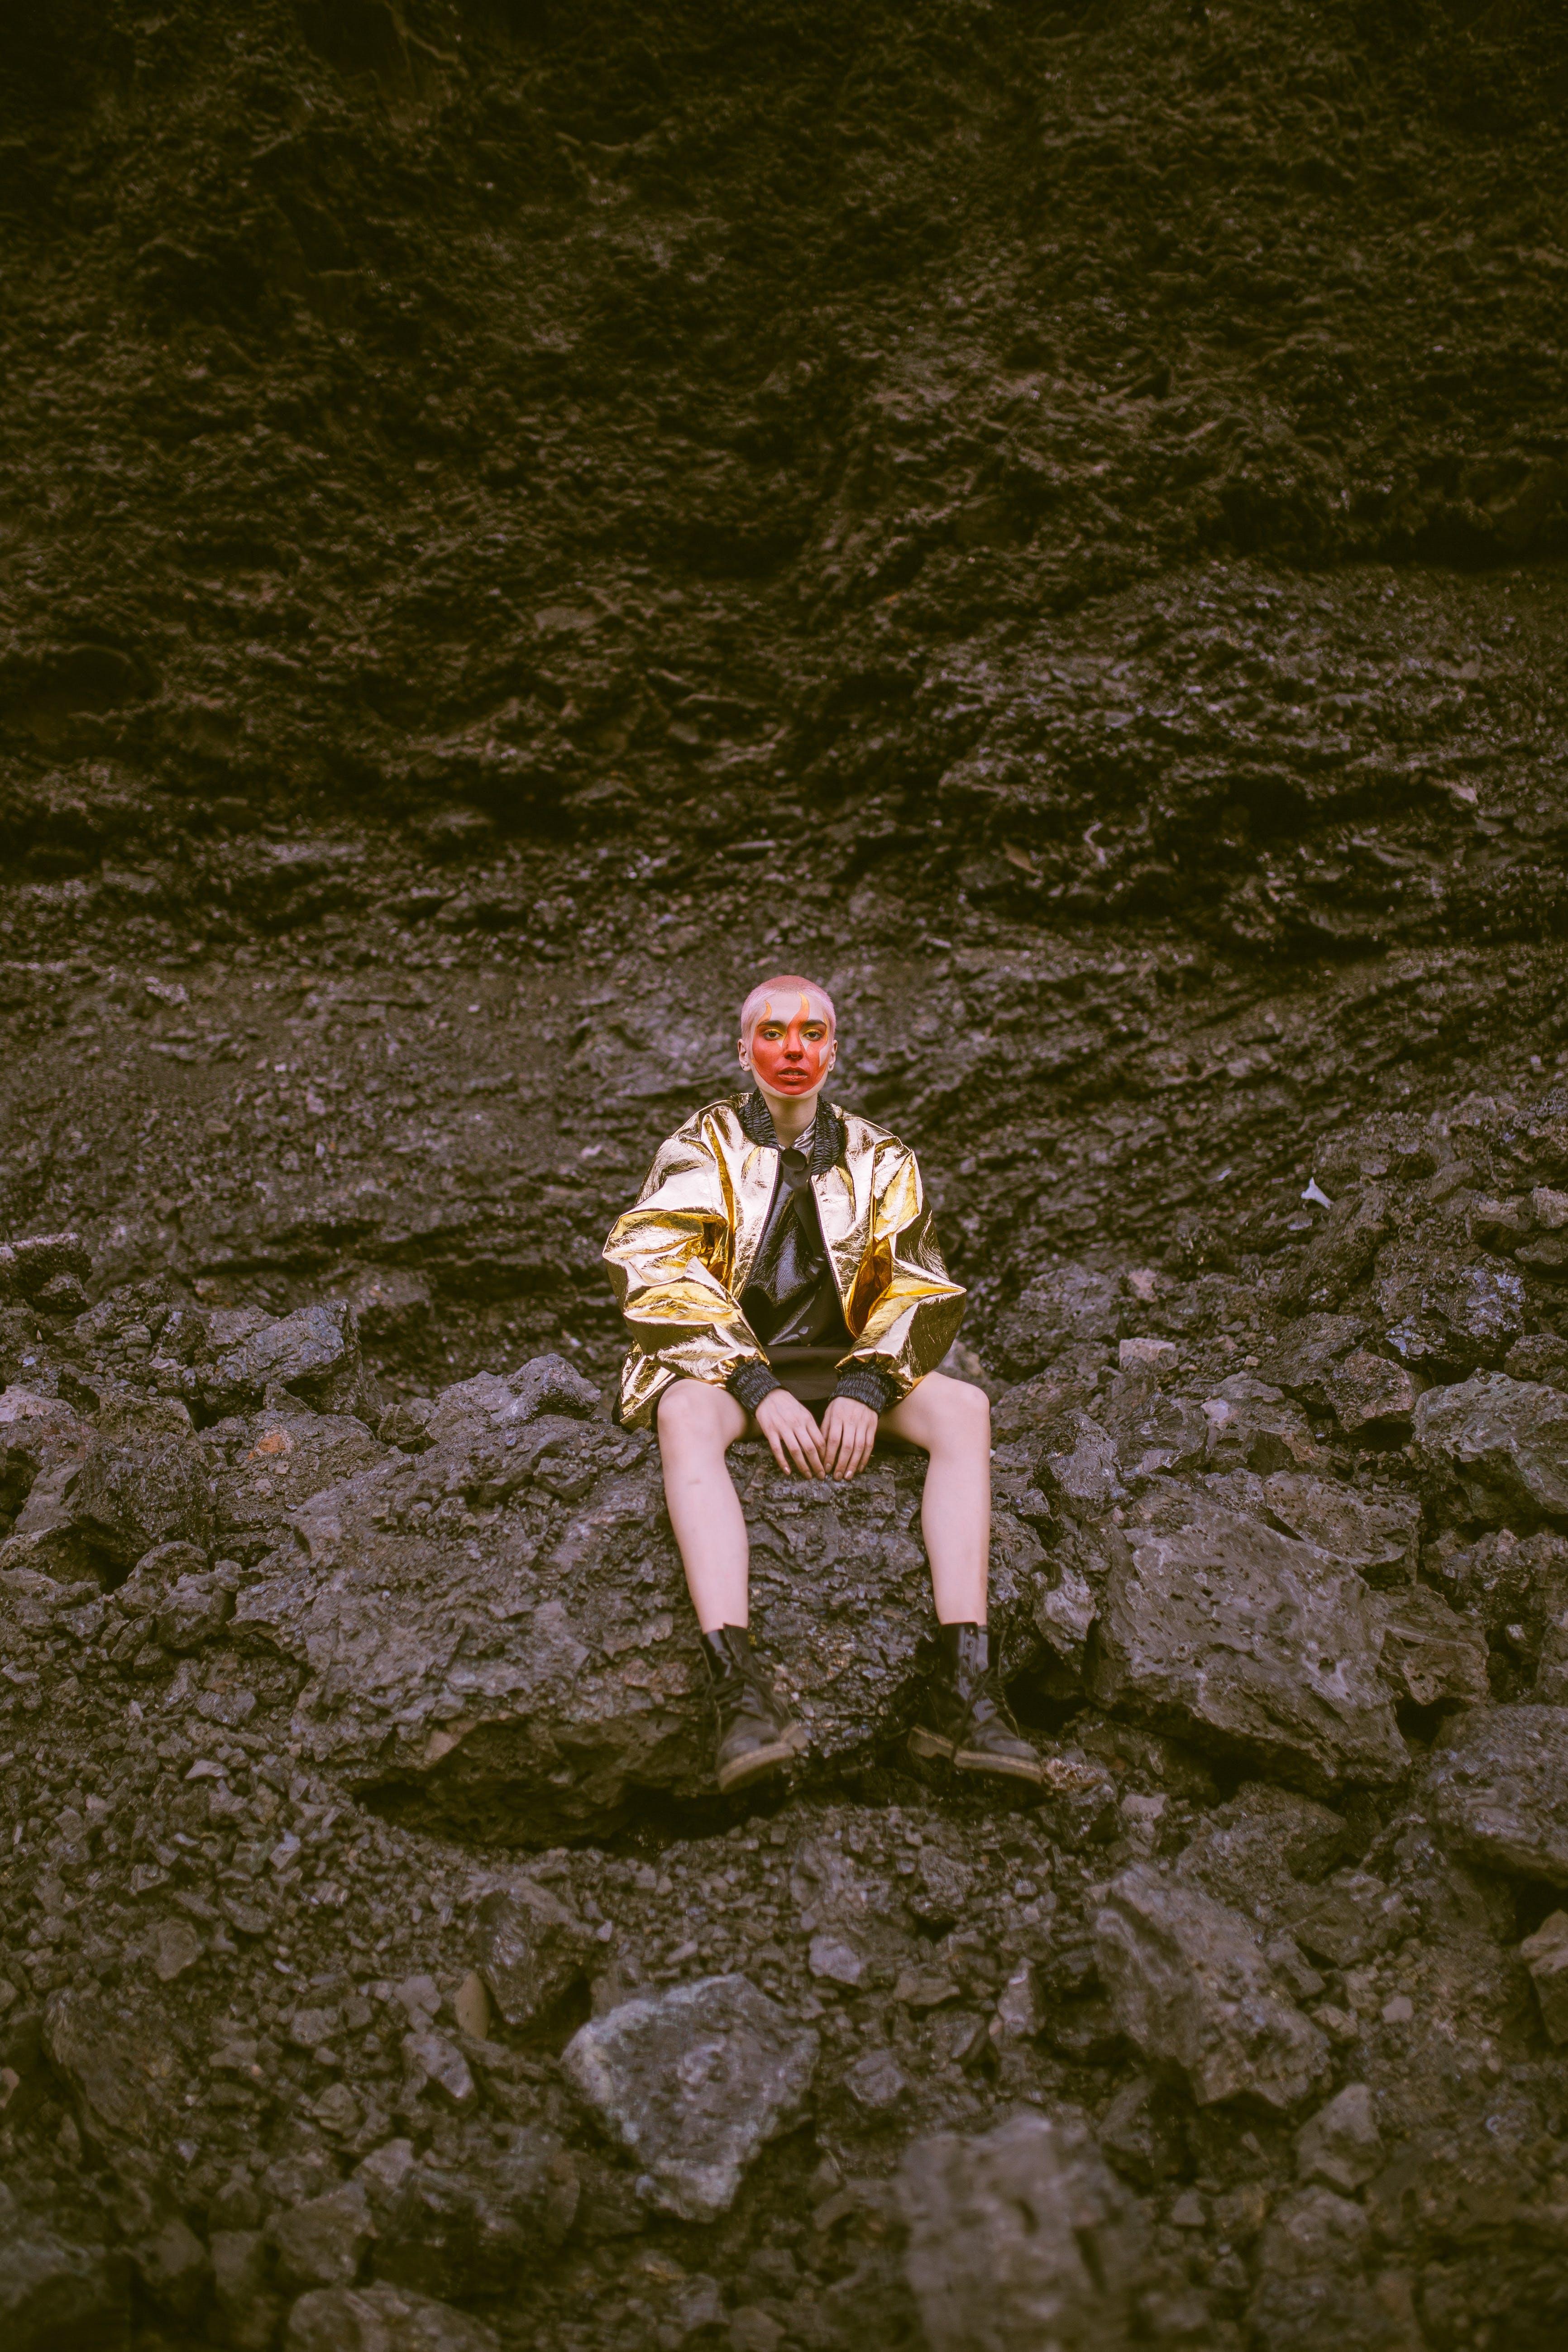 Man Wearing Gold Jacket Sitting on Stone